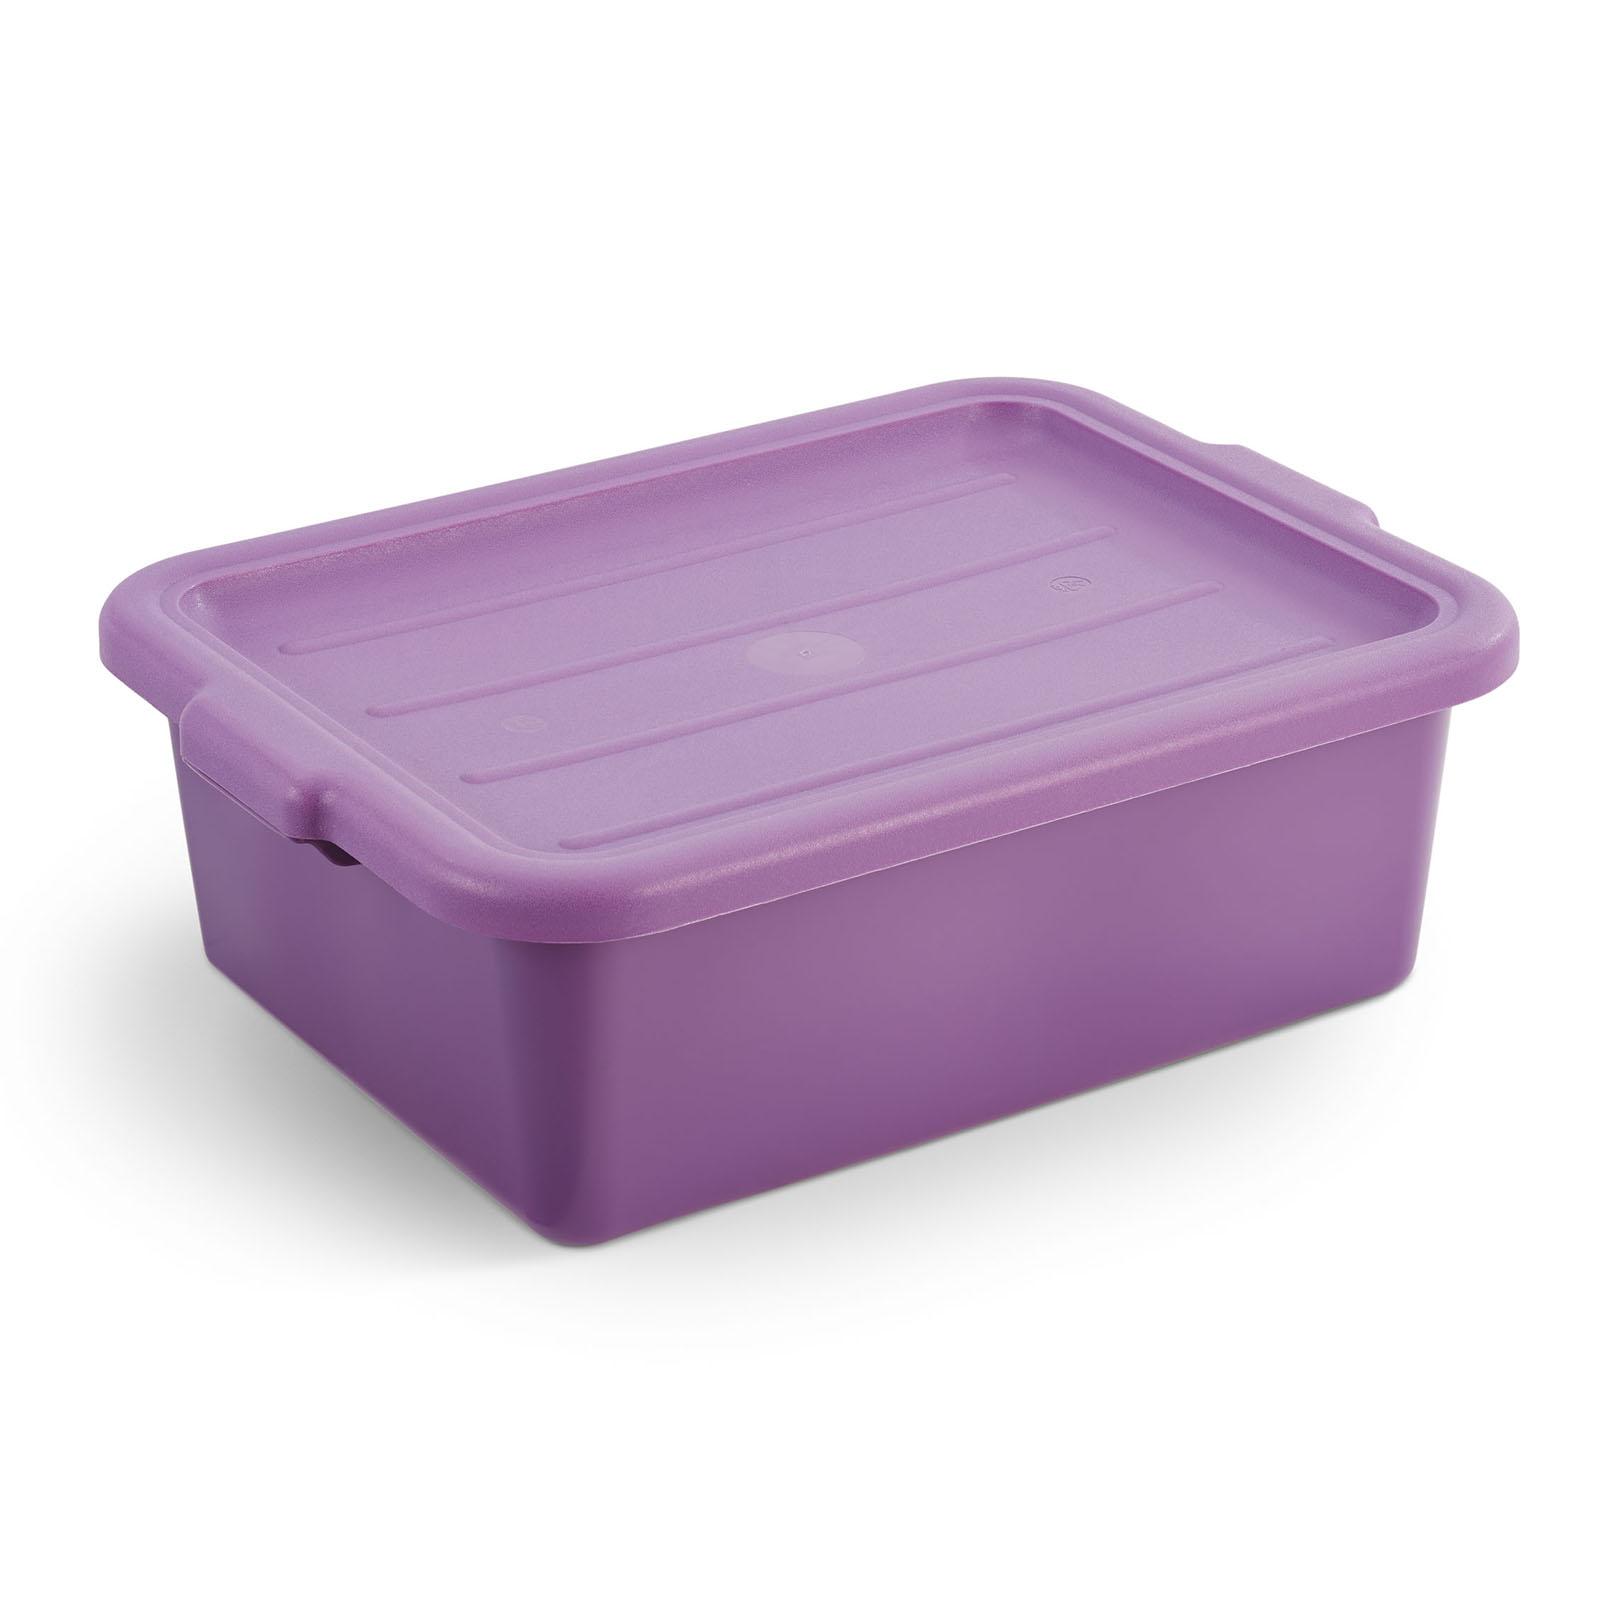 Vollrath 1535-C80 food storage container, box